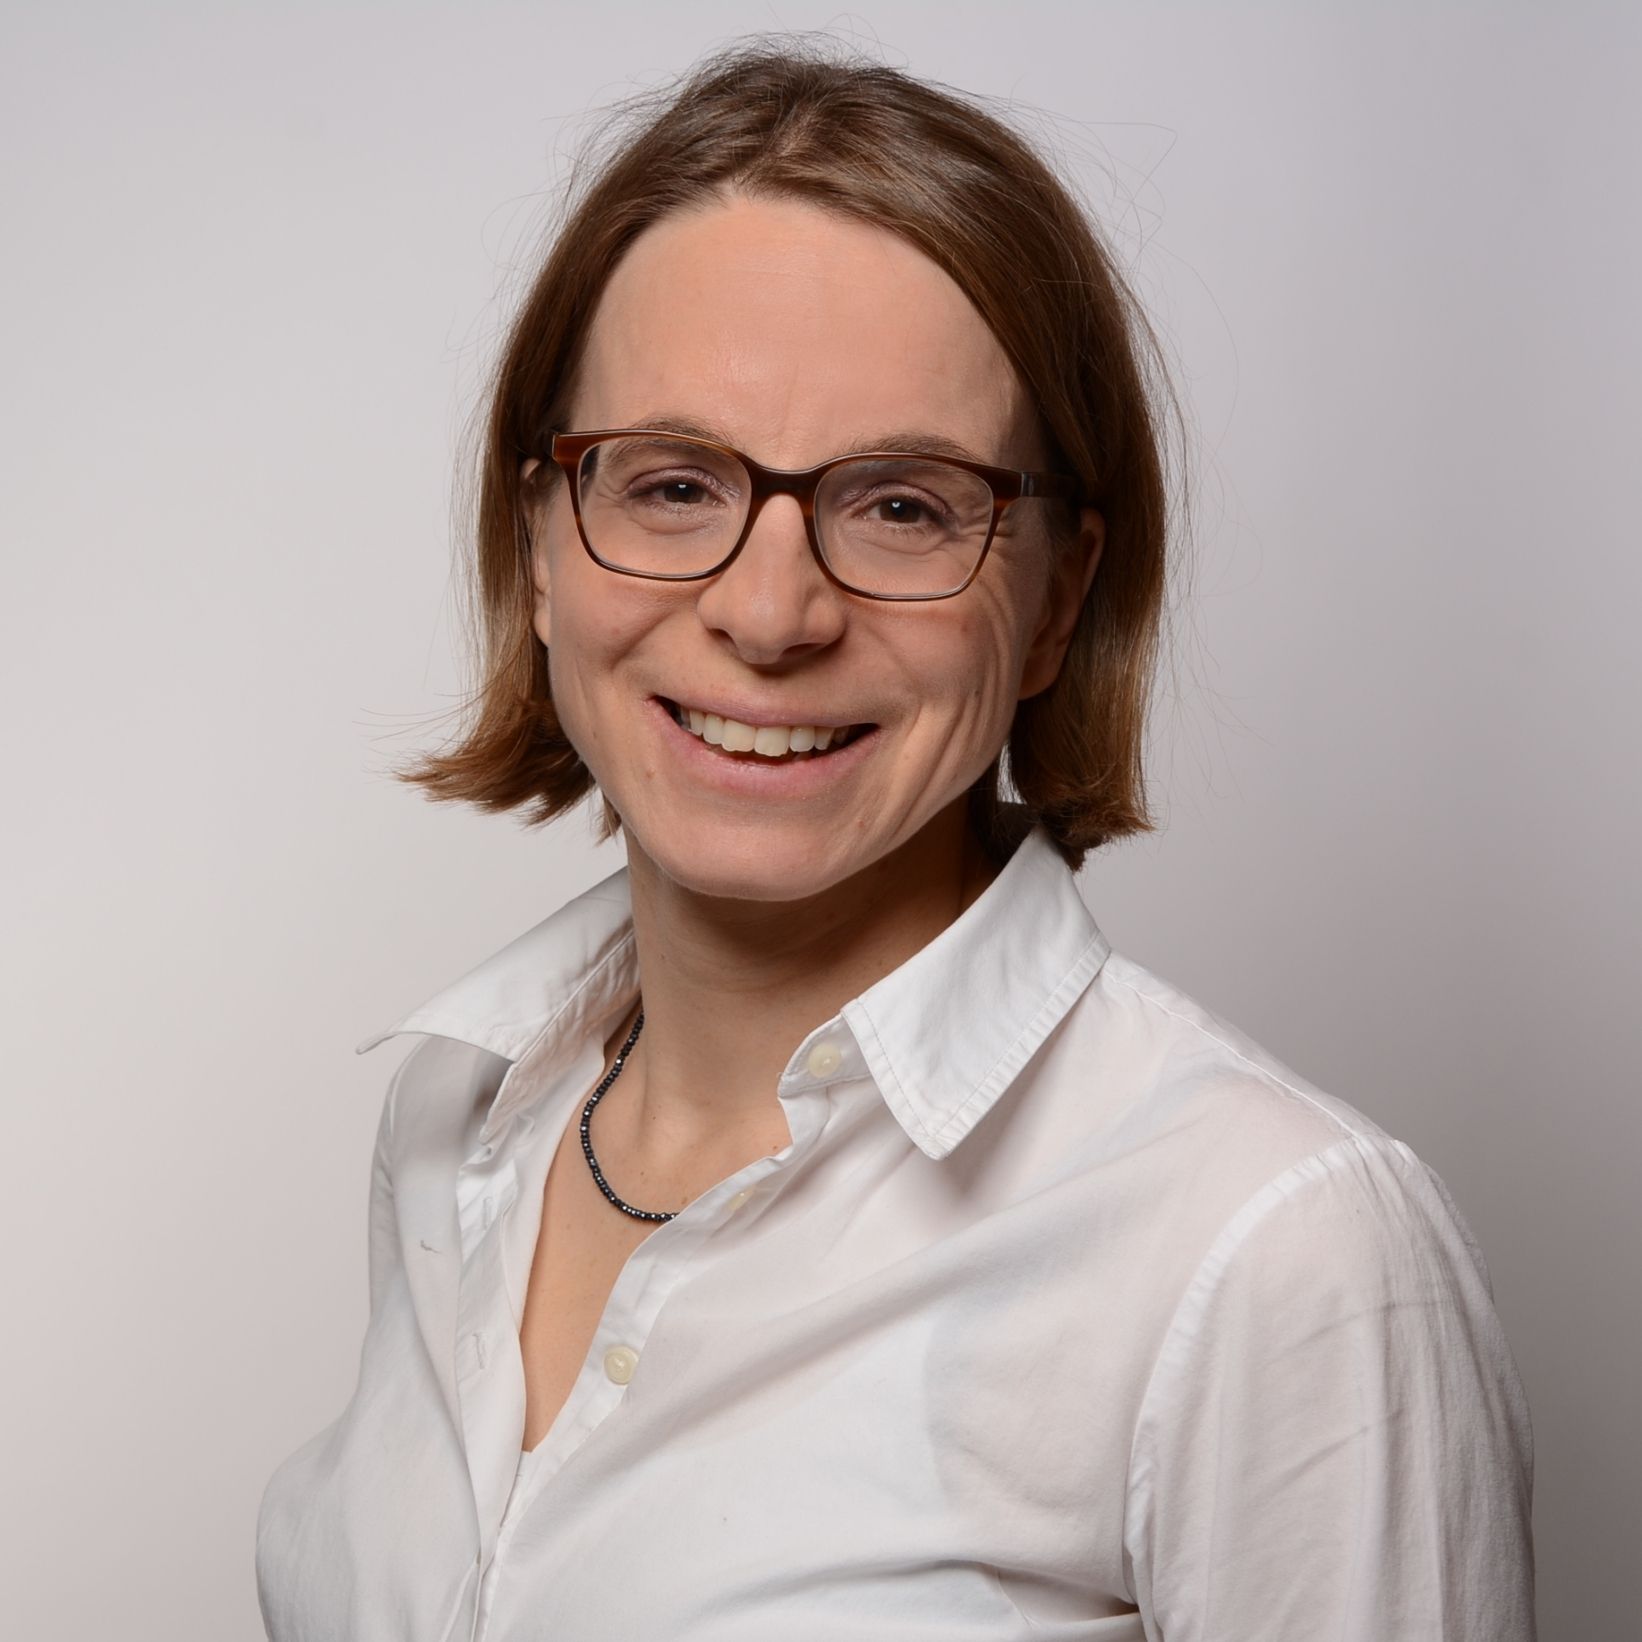 Dr. Kerstin Janson